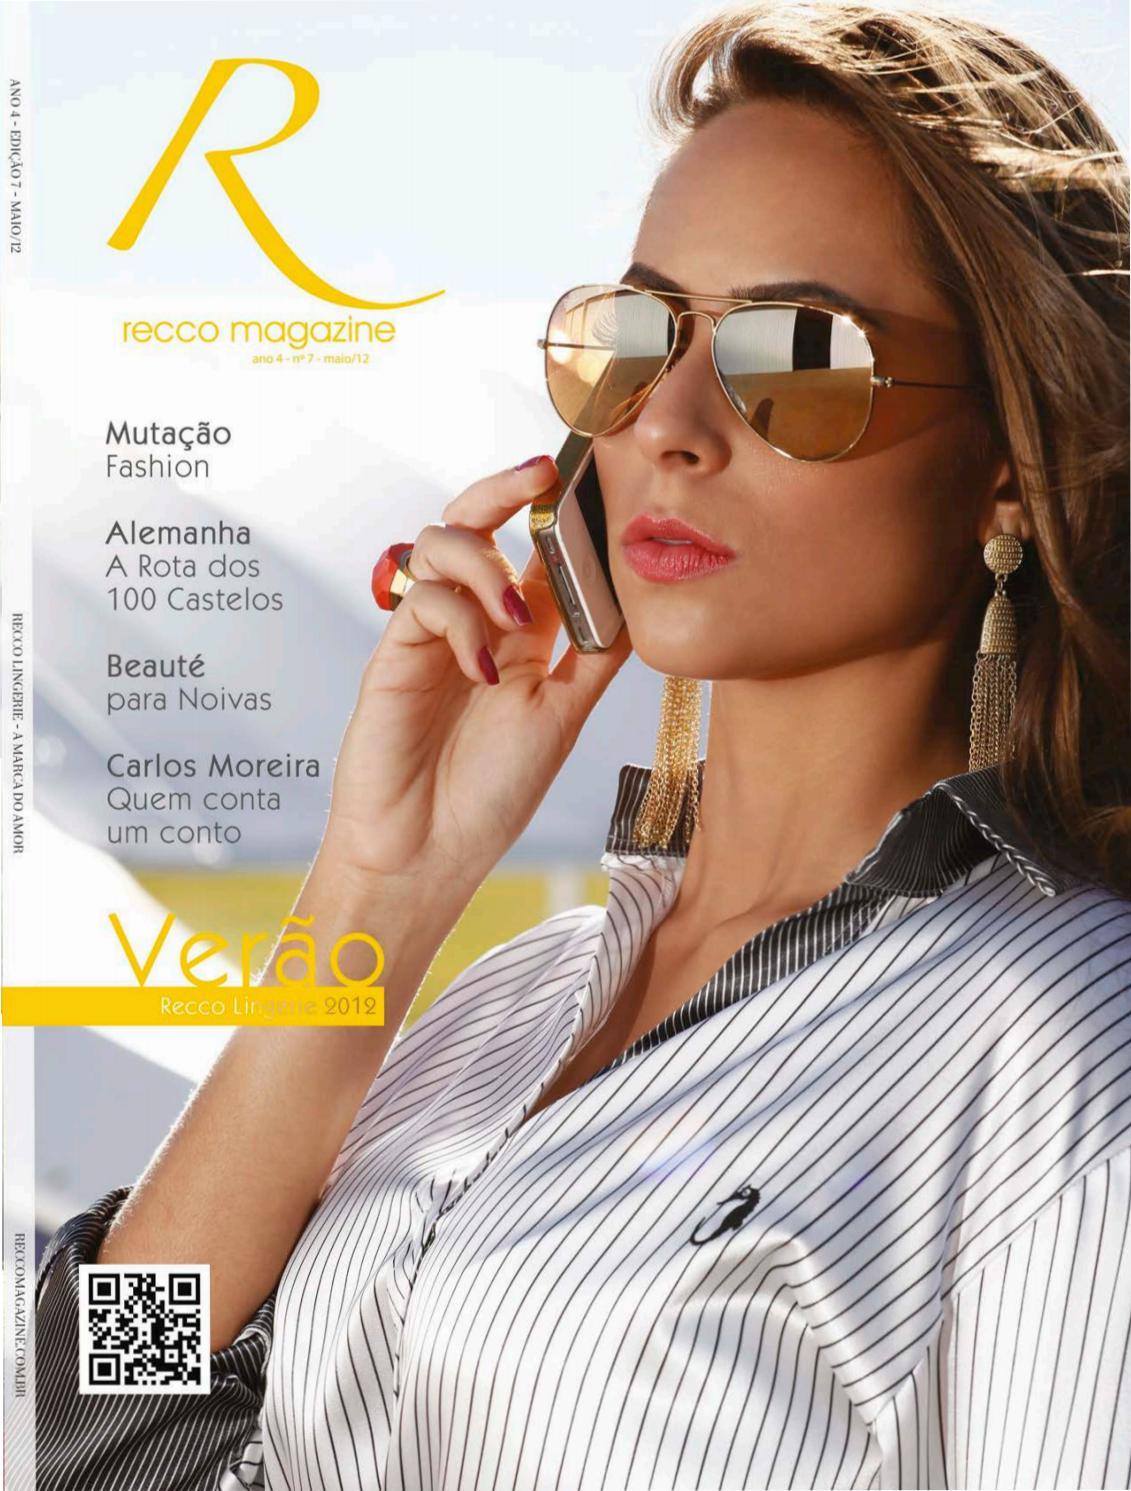 7e67e3aaf Recco Magazine 7ª ed by Recco Lingerie - issuu